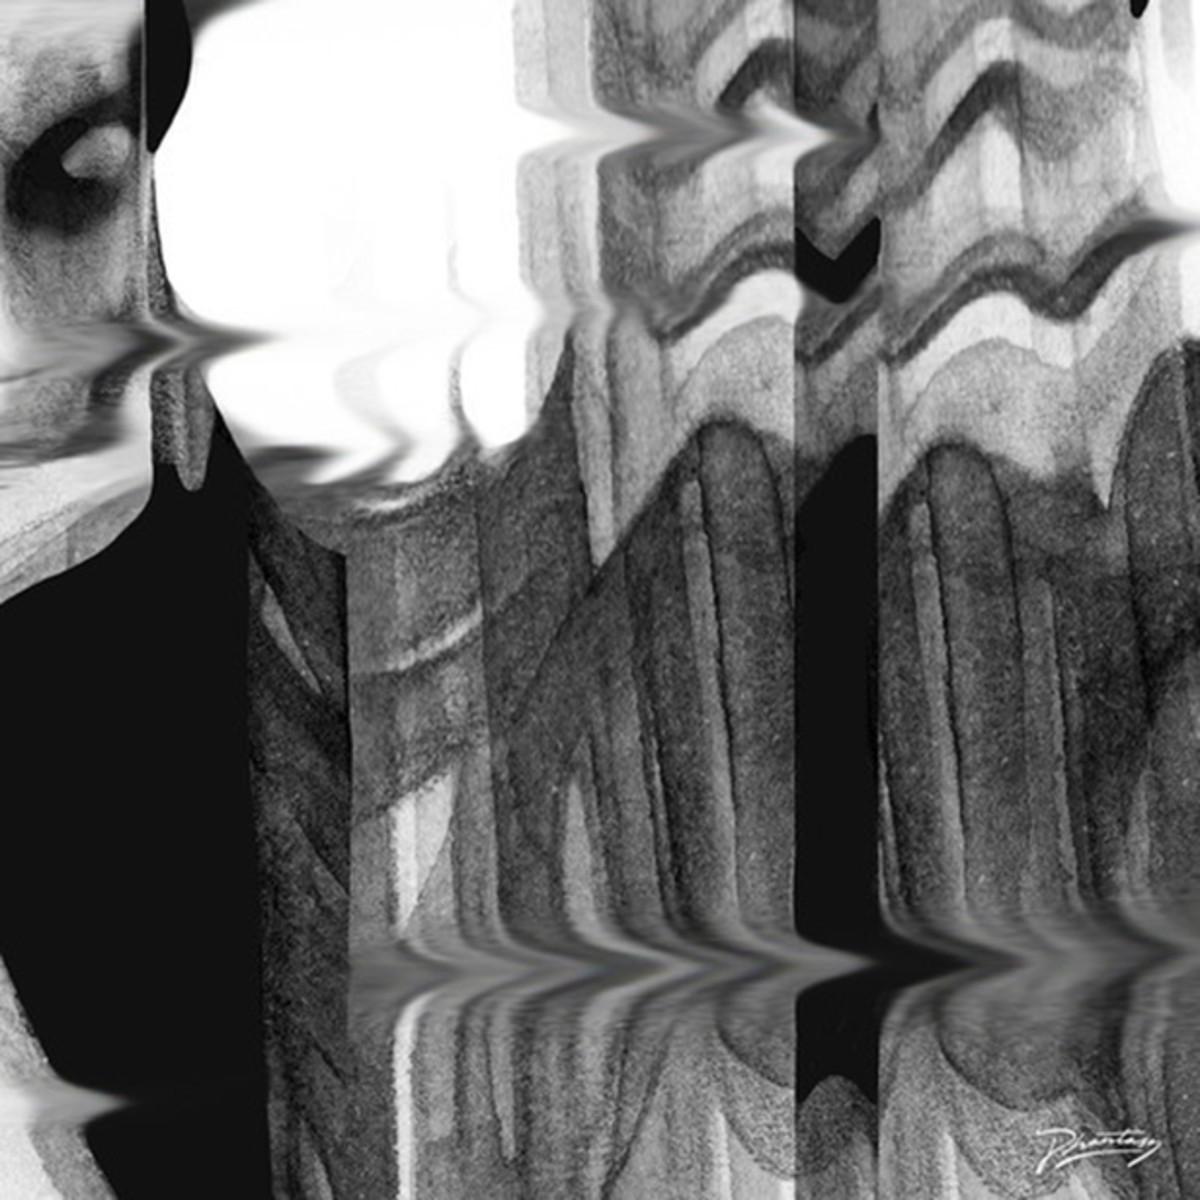 artworks-000079305529-ygc2f7-t500x500